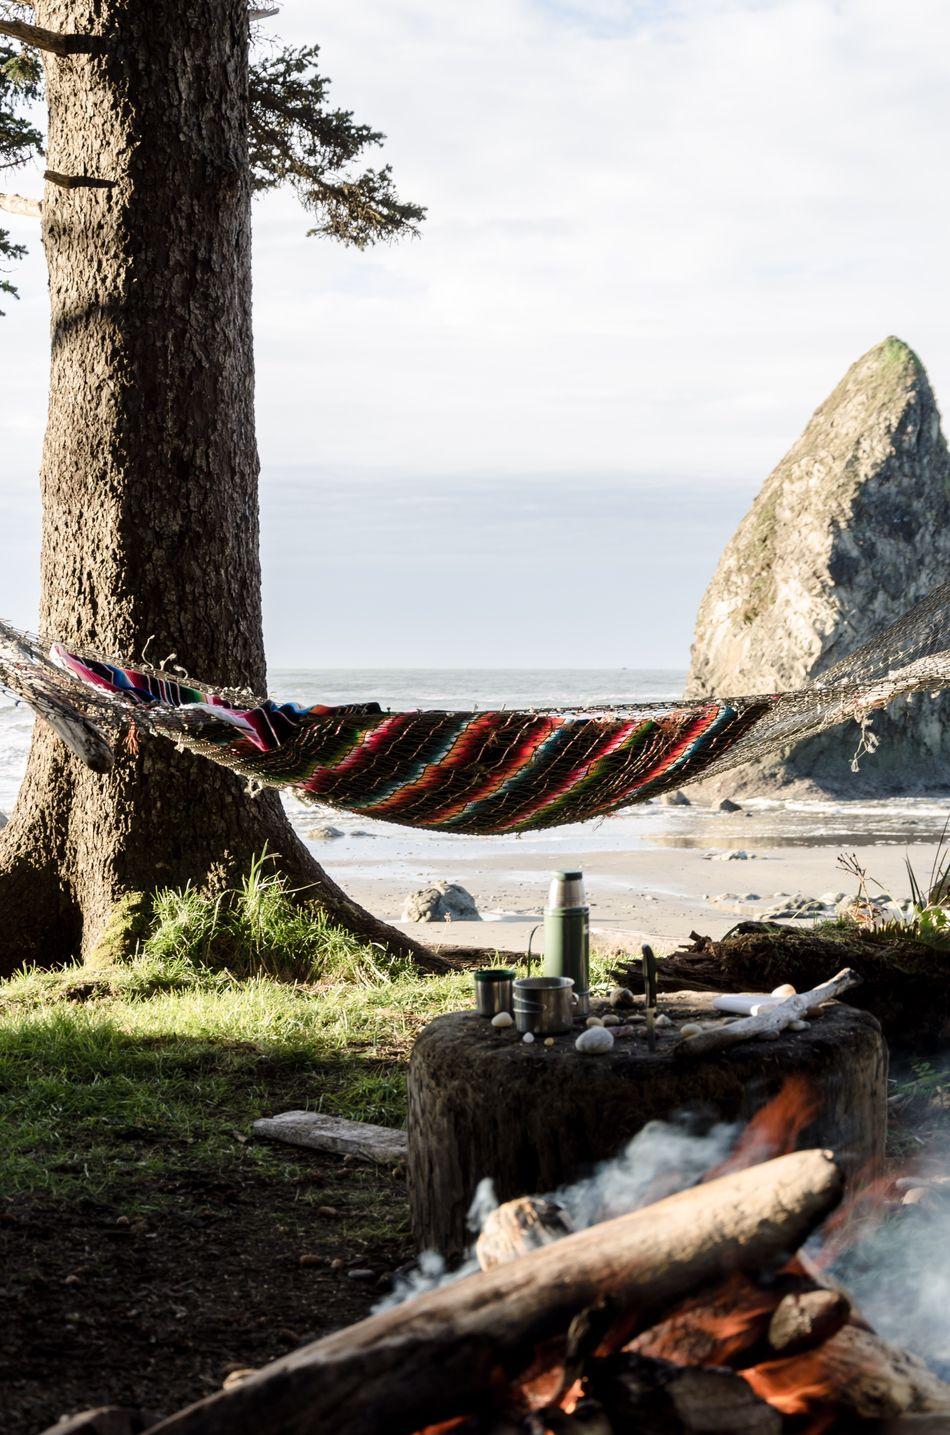 Morning coffee PNW Nature Ocean Hammock Camping Olympicnationalpark Campfire Washington